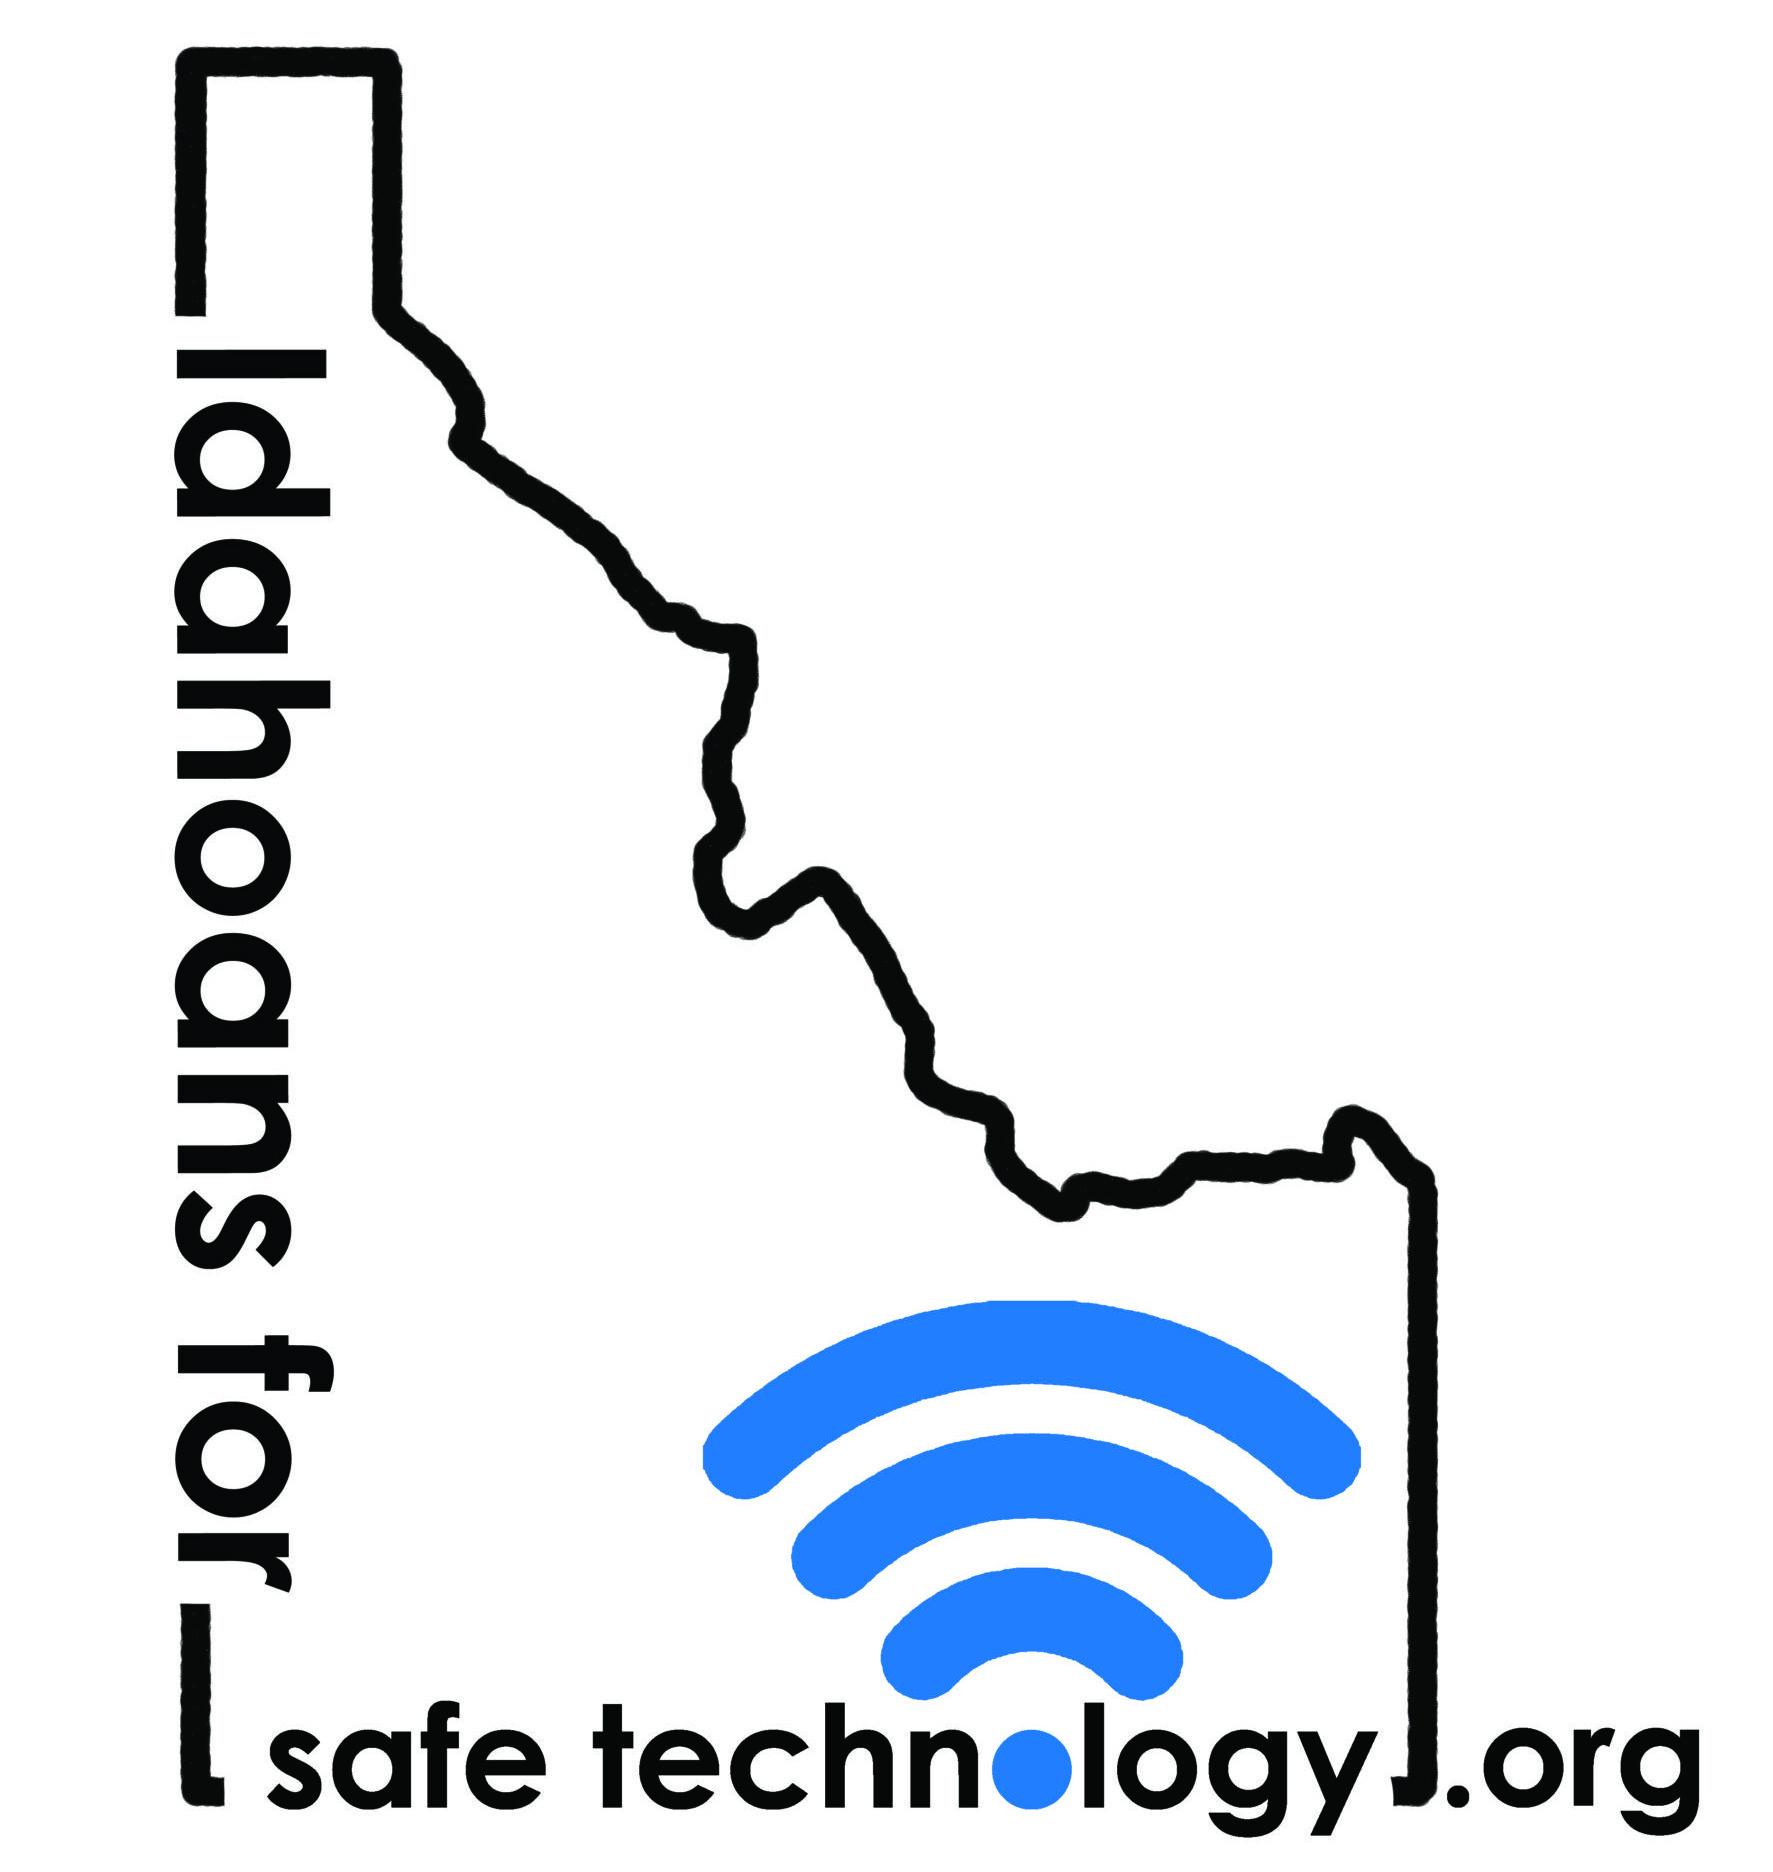 Idahoans for Safe Technology Foundation, Inc